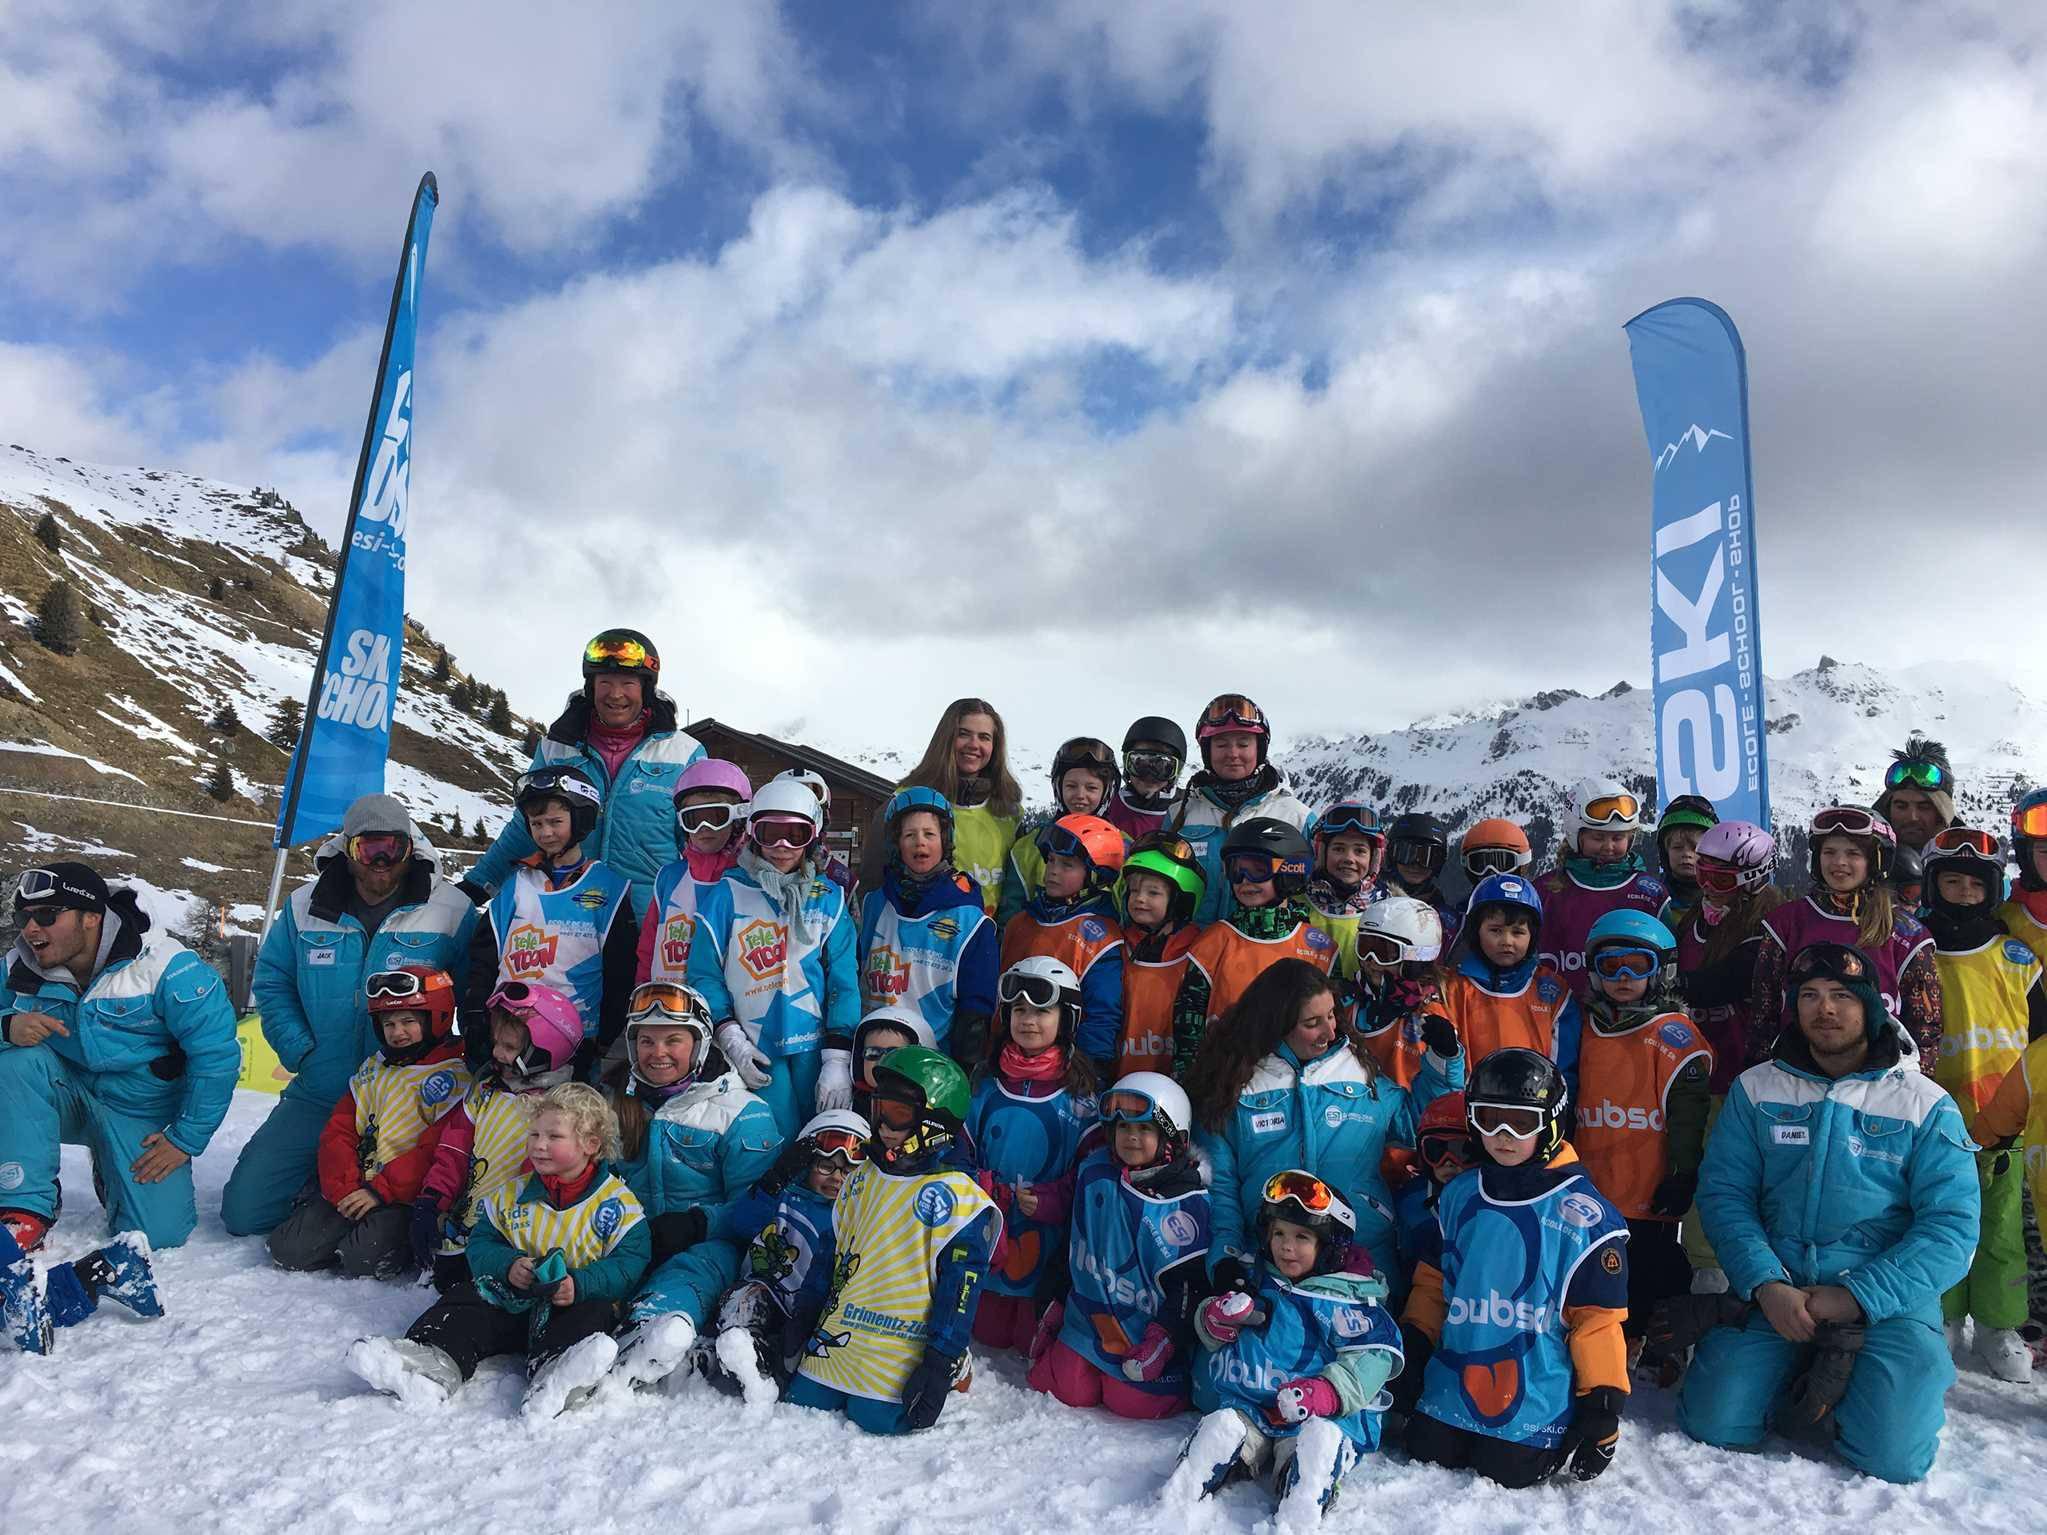 moniteurs de ski saison 2018-2019